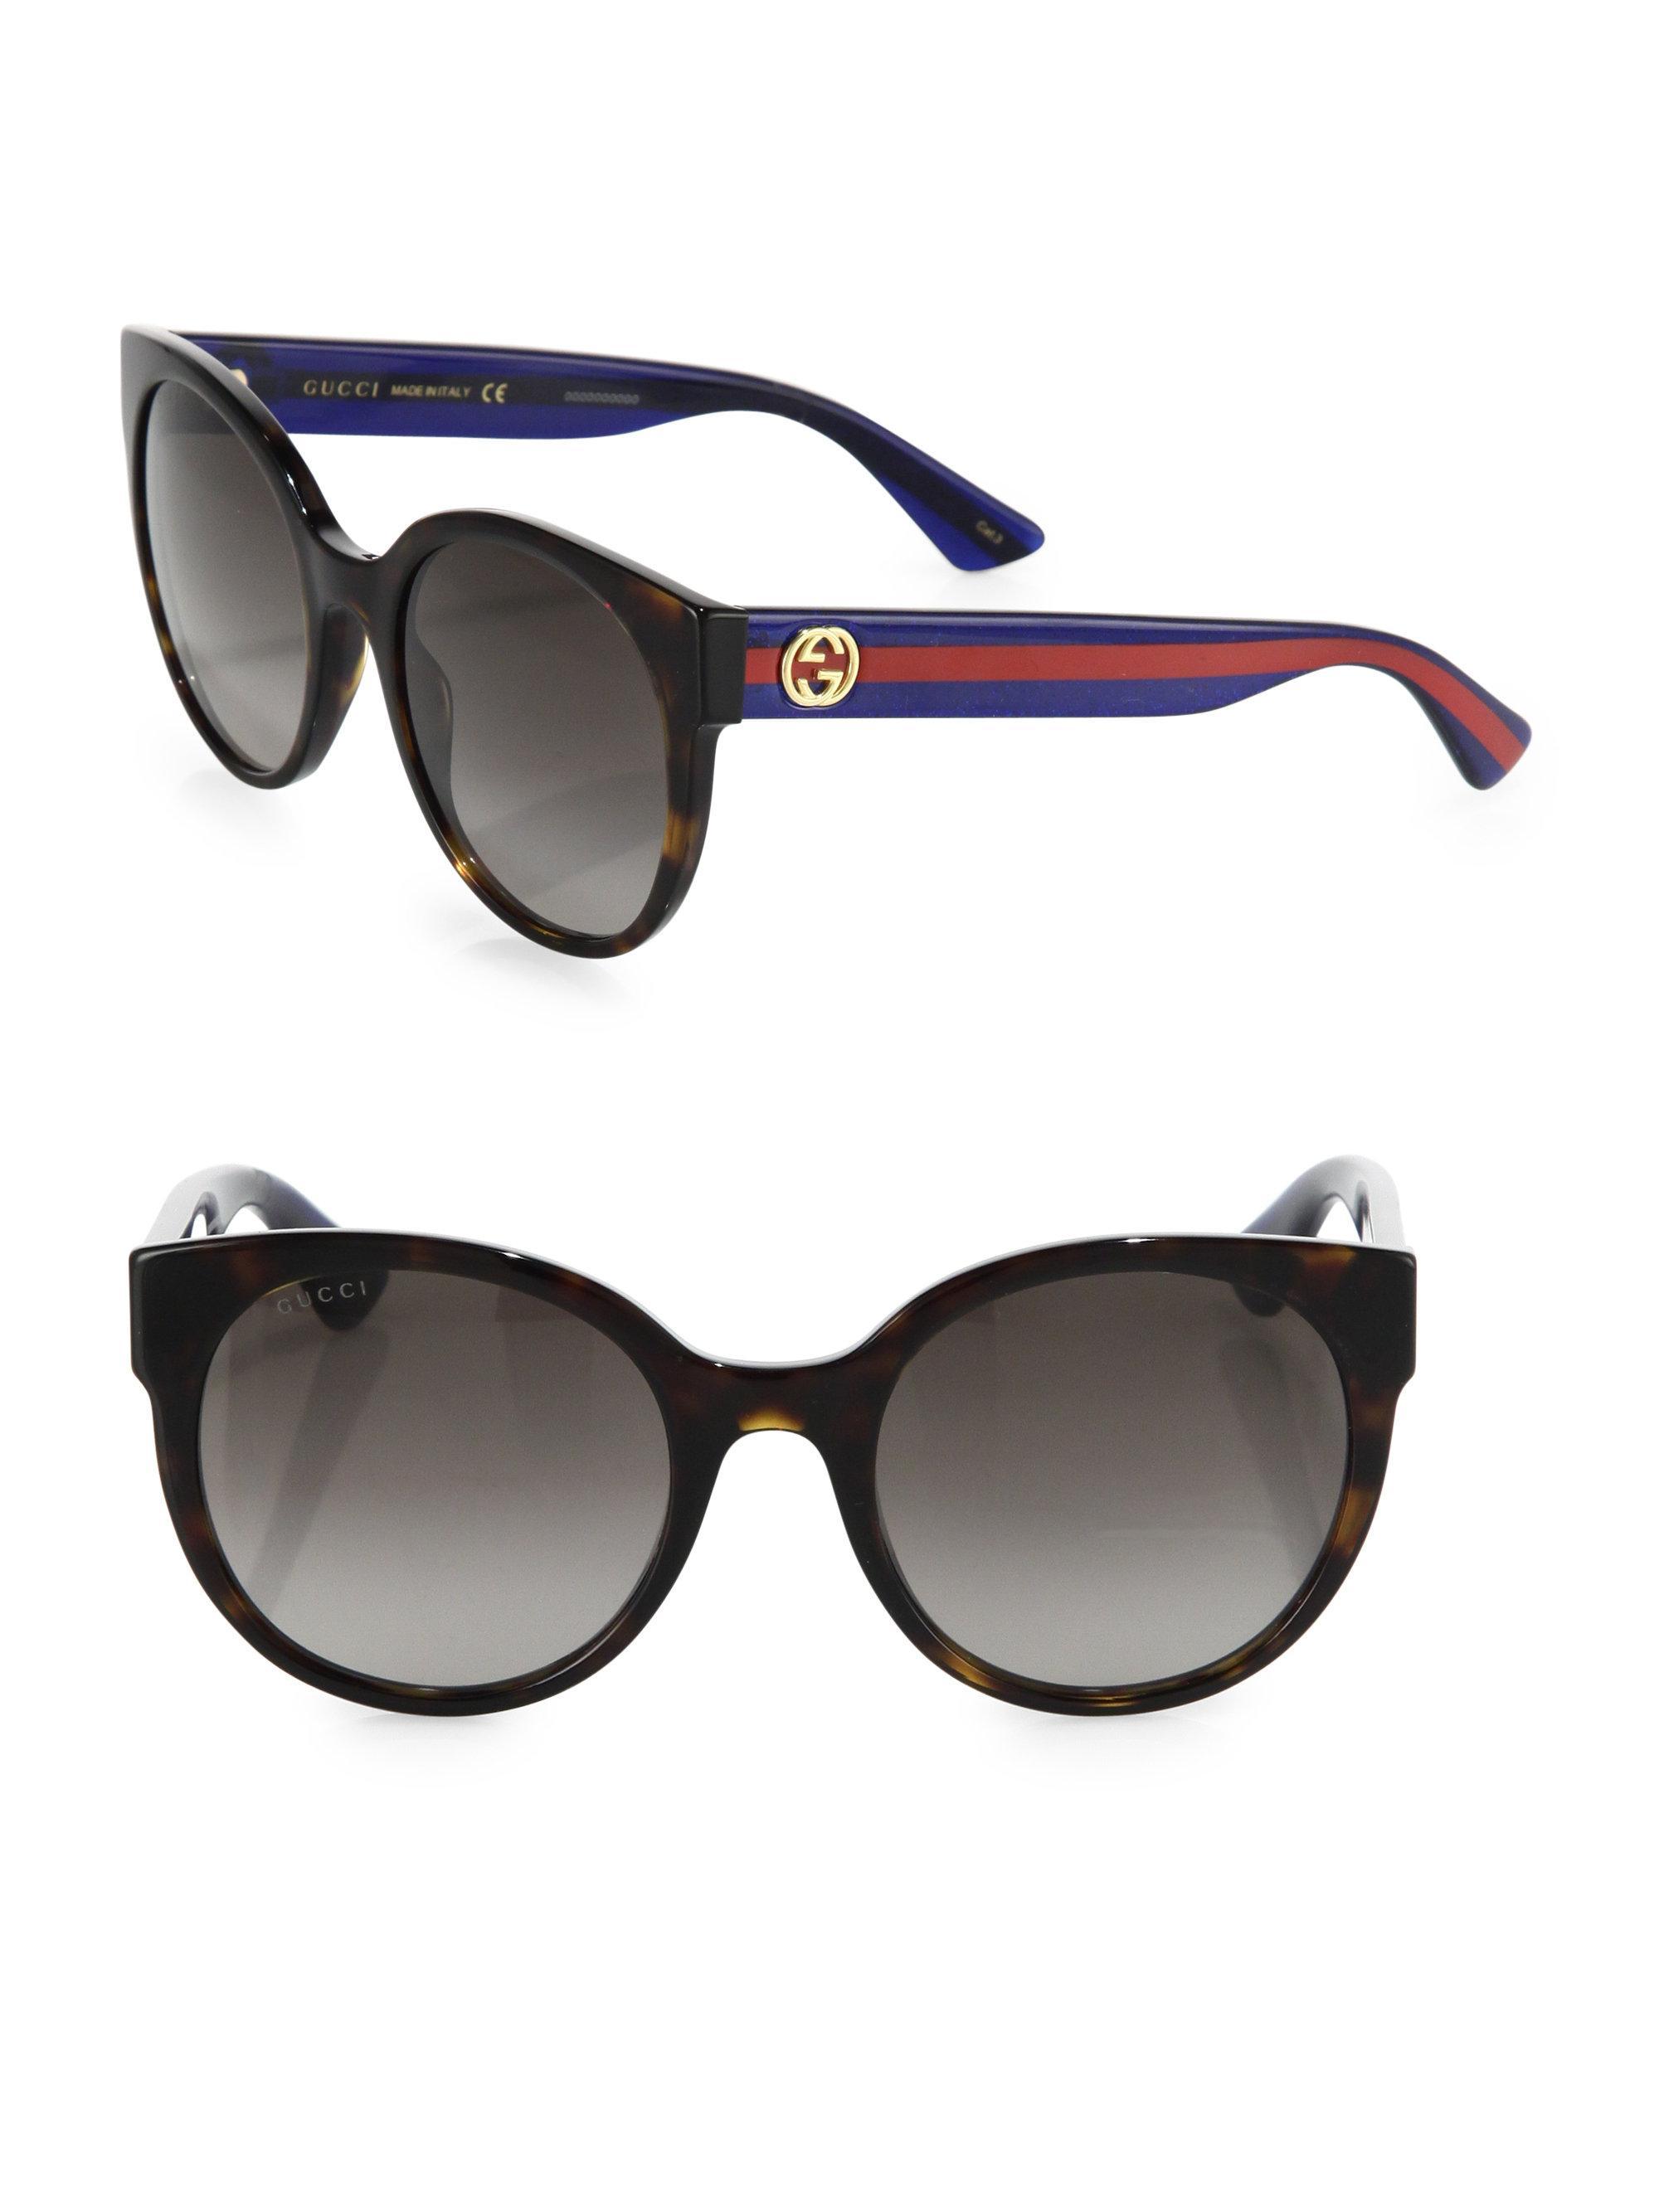 6879c586b06 Lyst - Gucci Women s 54mm Web-temple Round Sunglasses - Havana